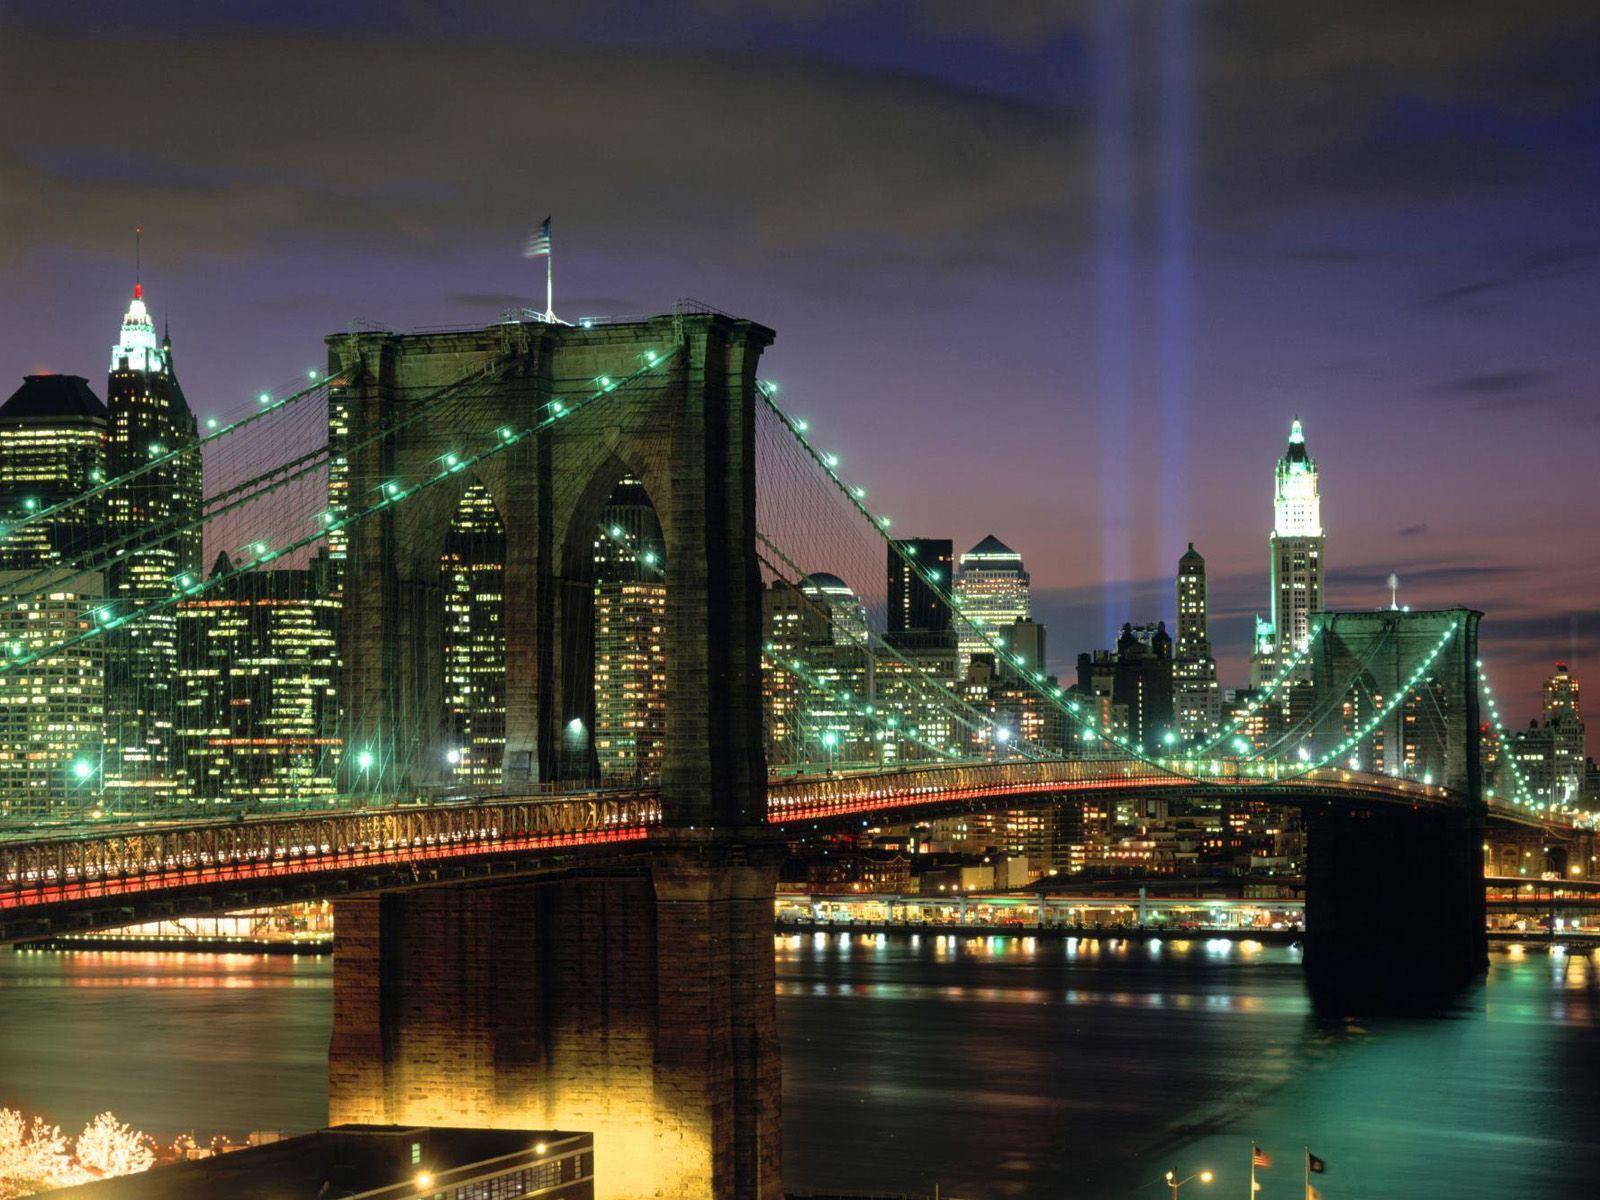 Best Wallpaper Night Brooklyn Bridge - 073de544b1deef399b822a467855ff44  2018.jpg